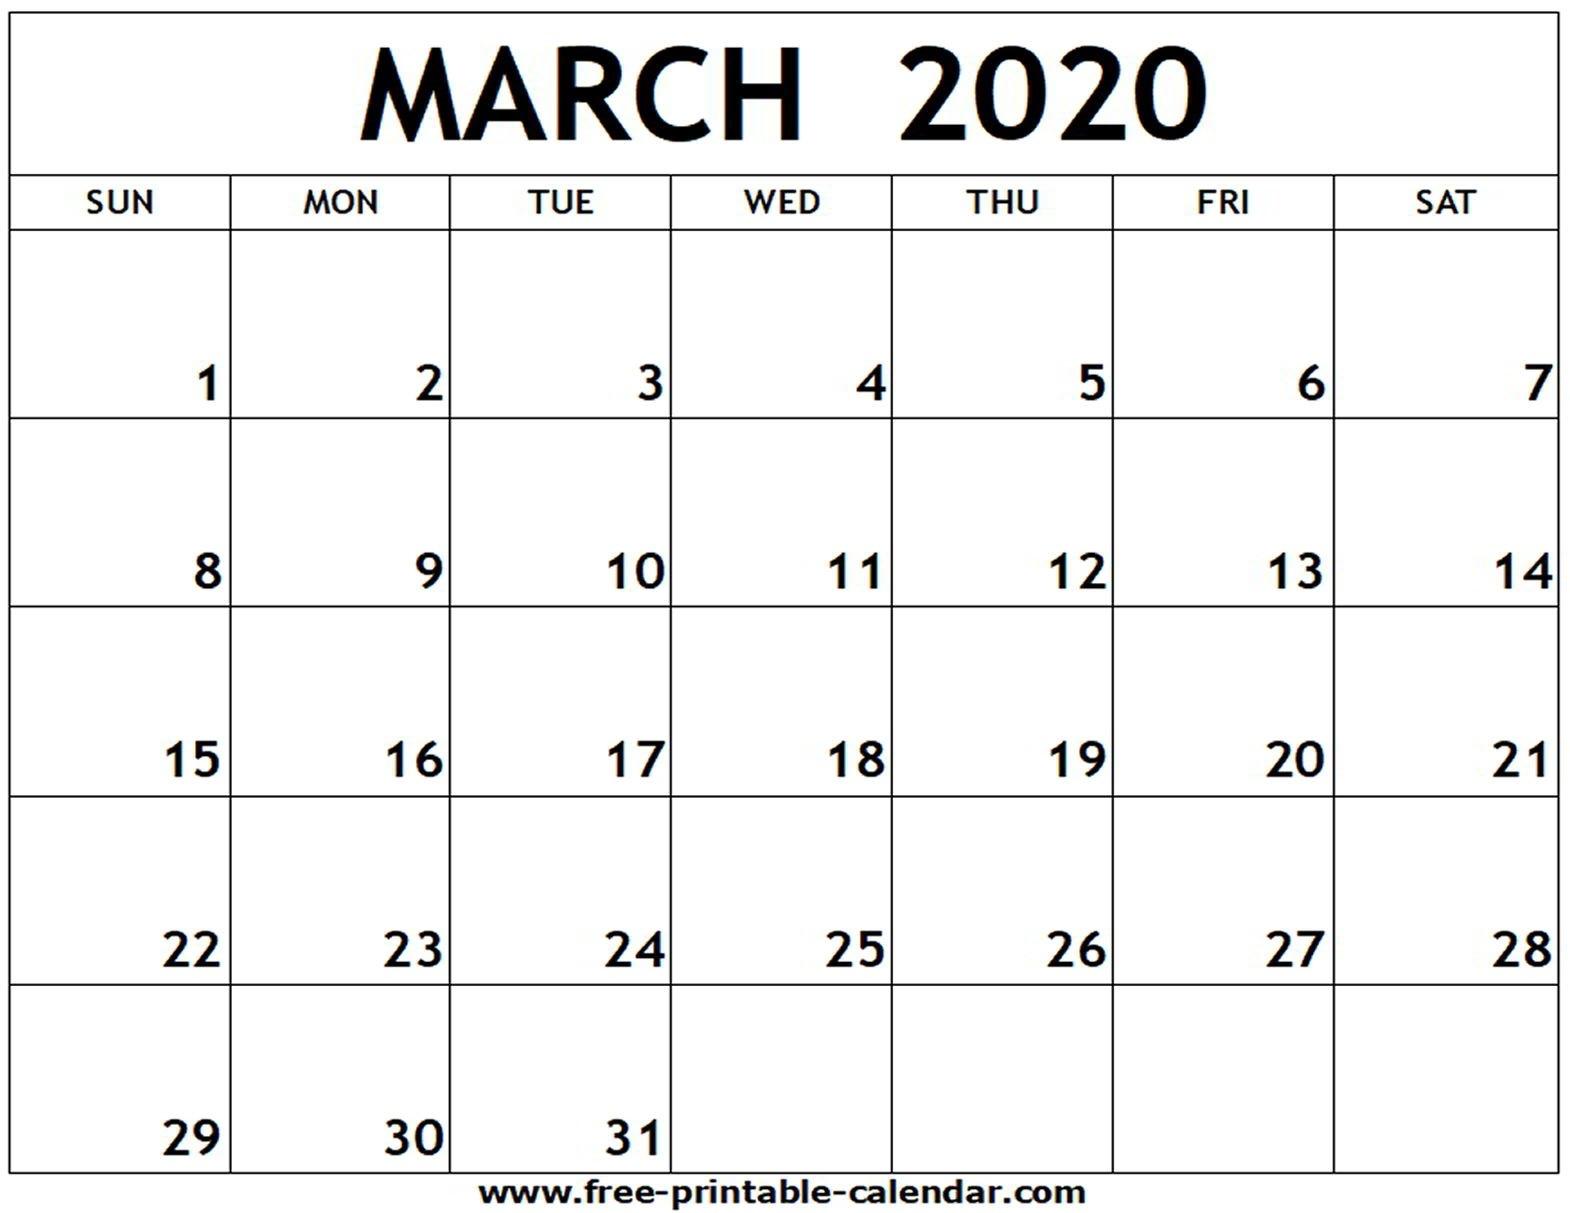 March 2020 Printable Calendar - Free-Printable-Calendar  Calendar Print Off